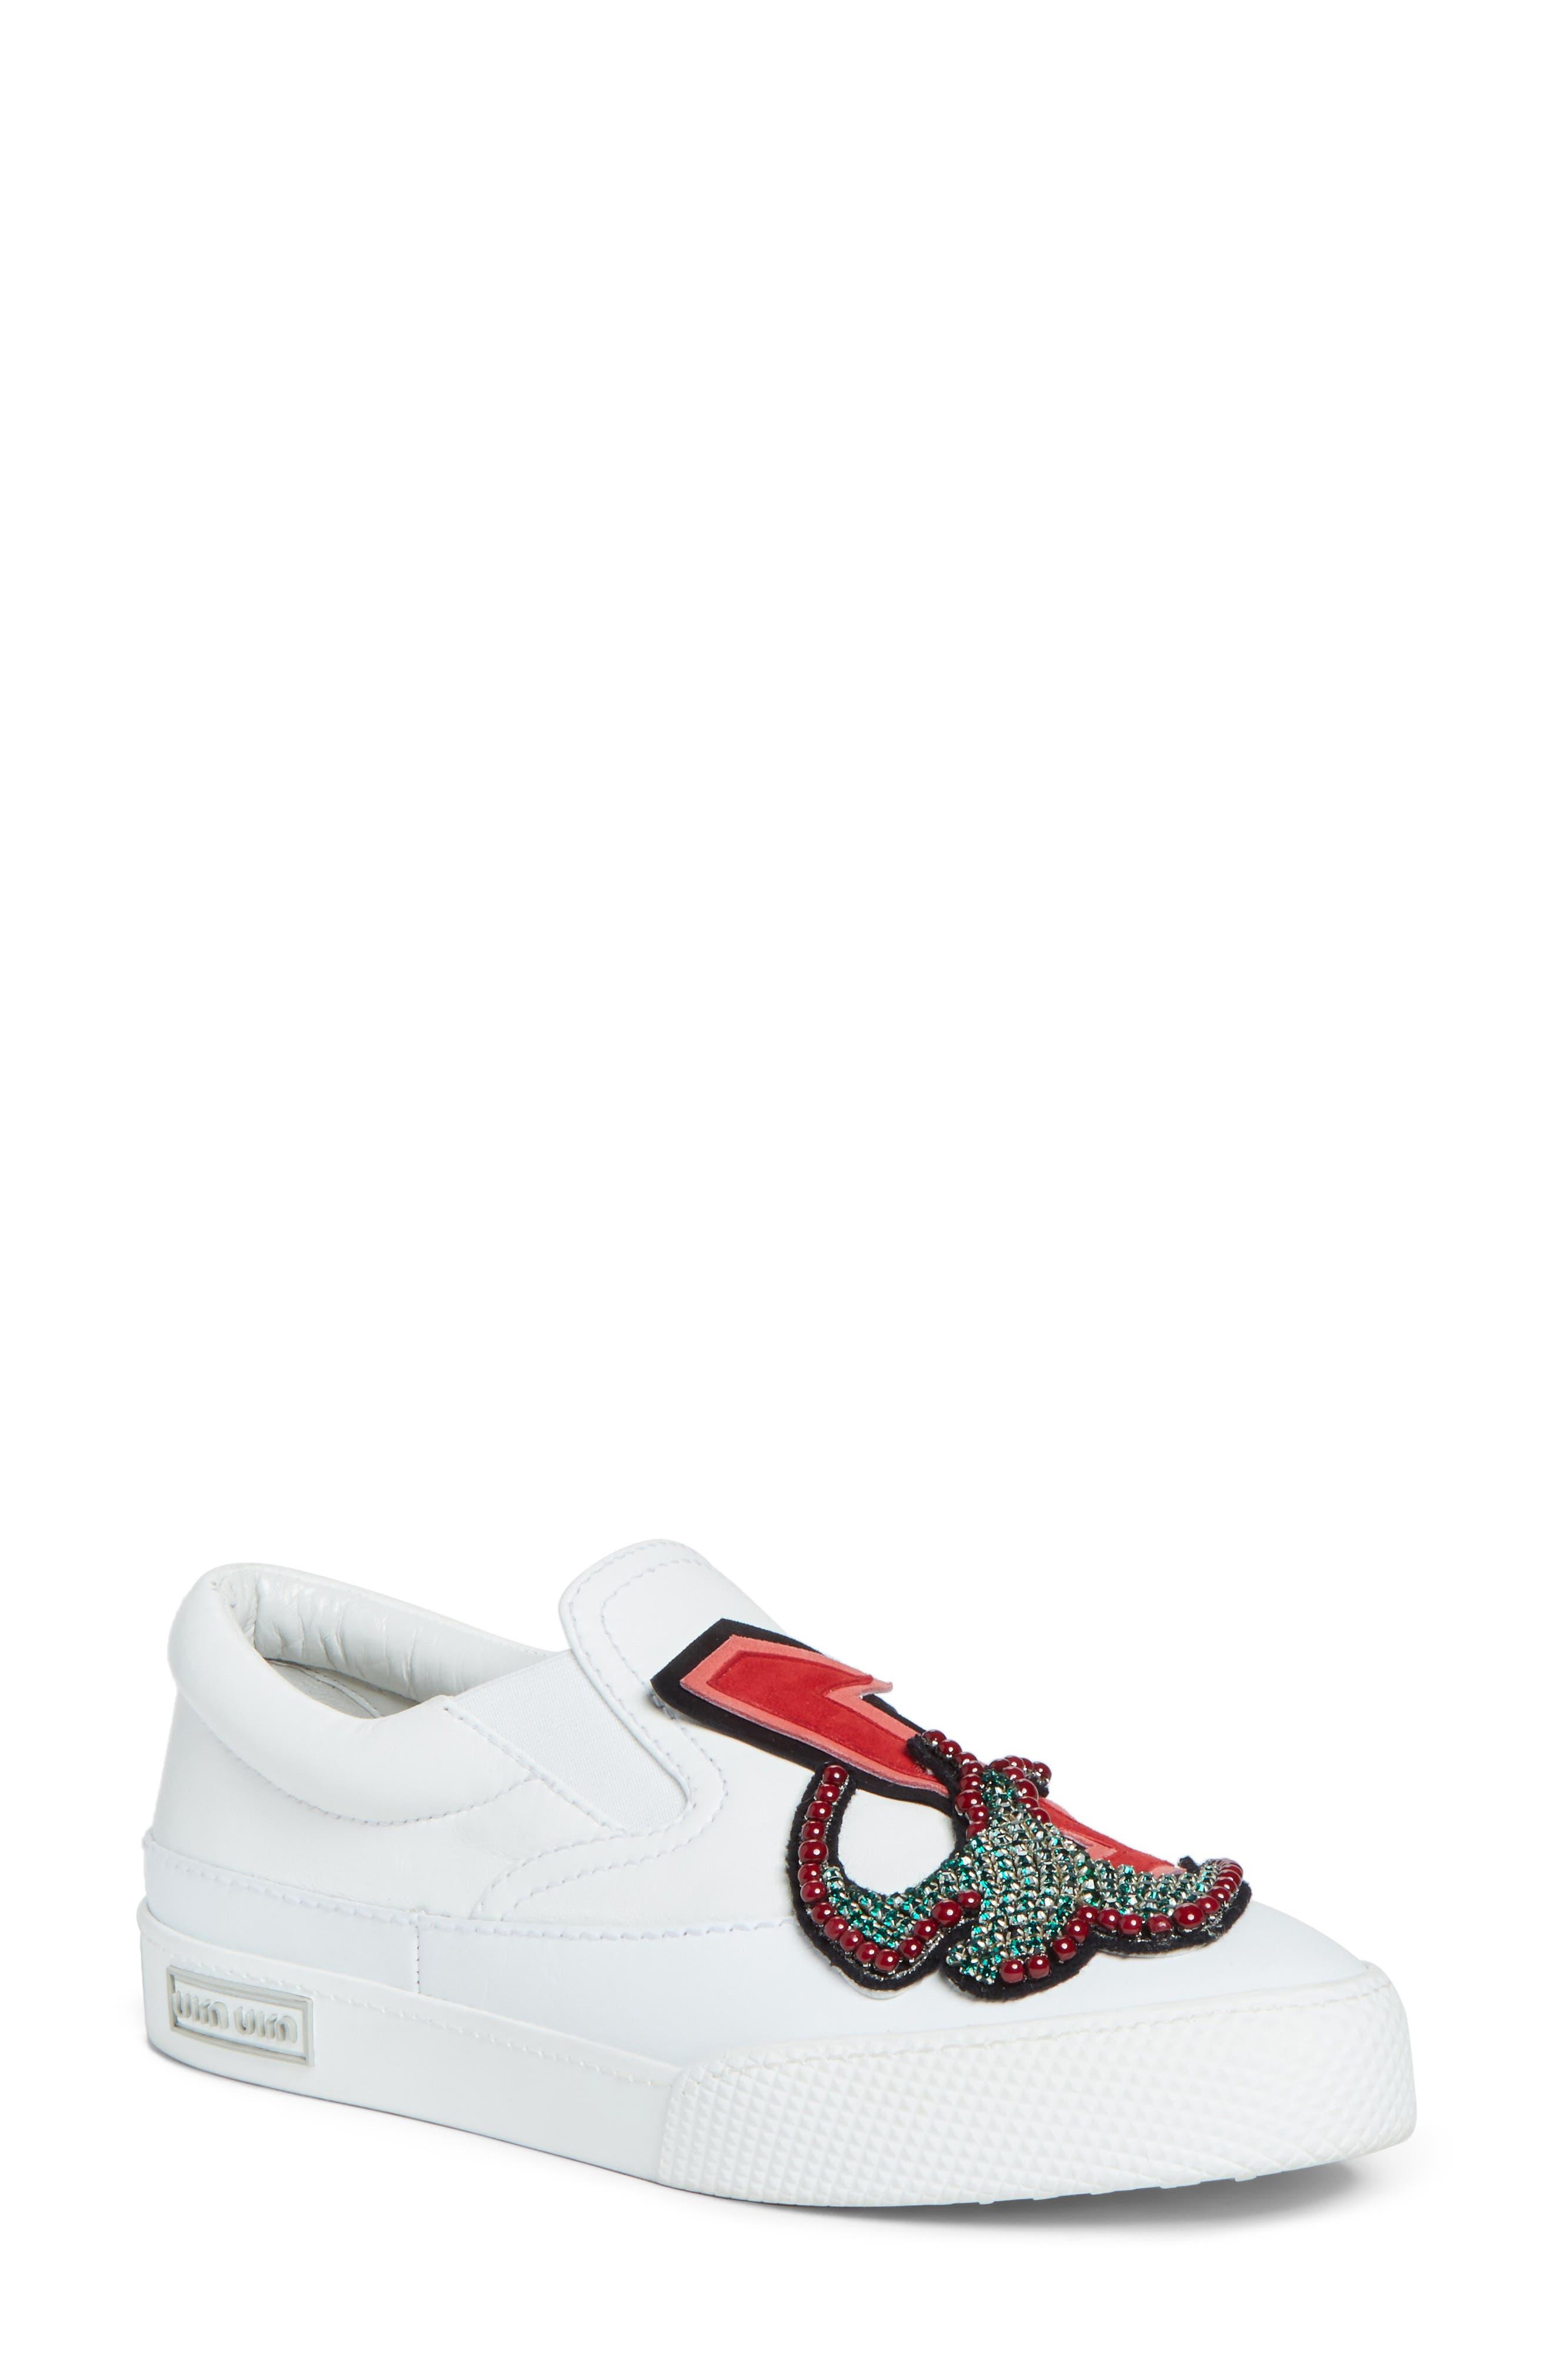 Embellished Slip-On Sneaker,                             Main thumbnail 1, color,